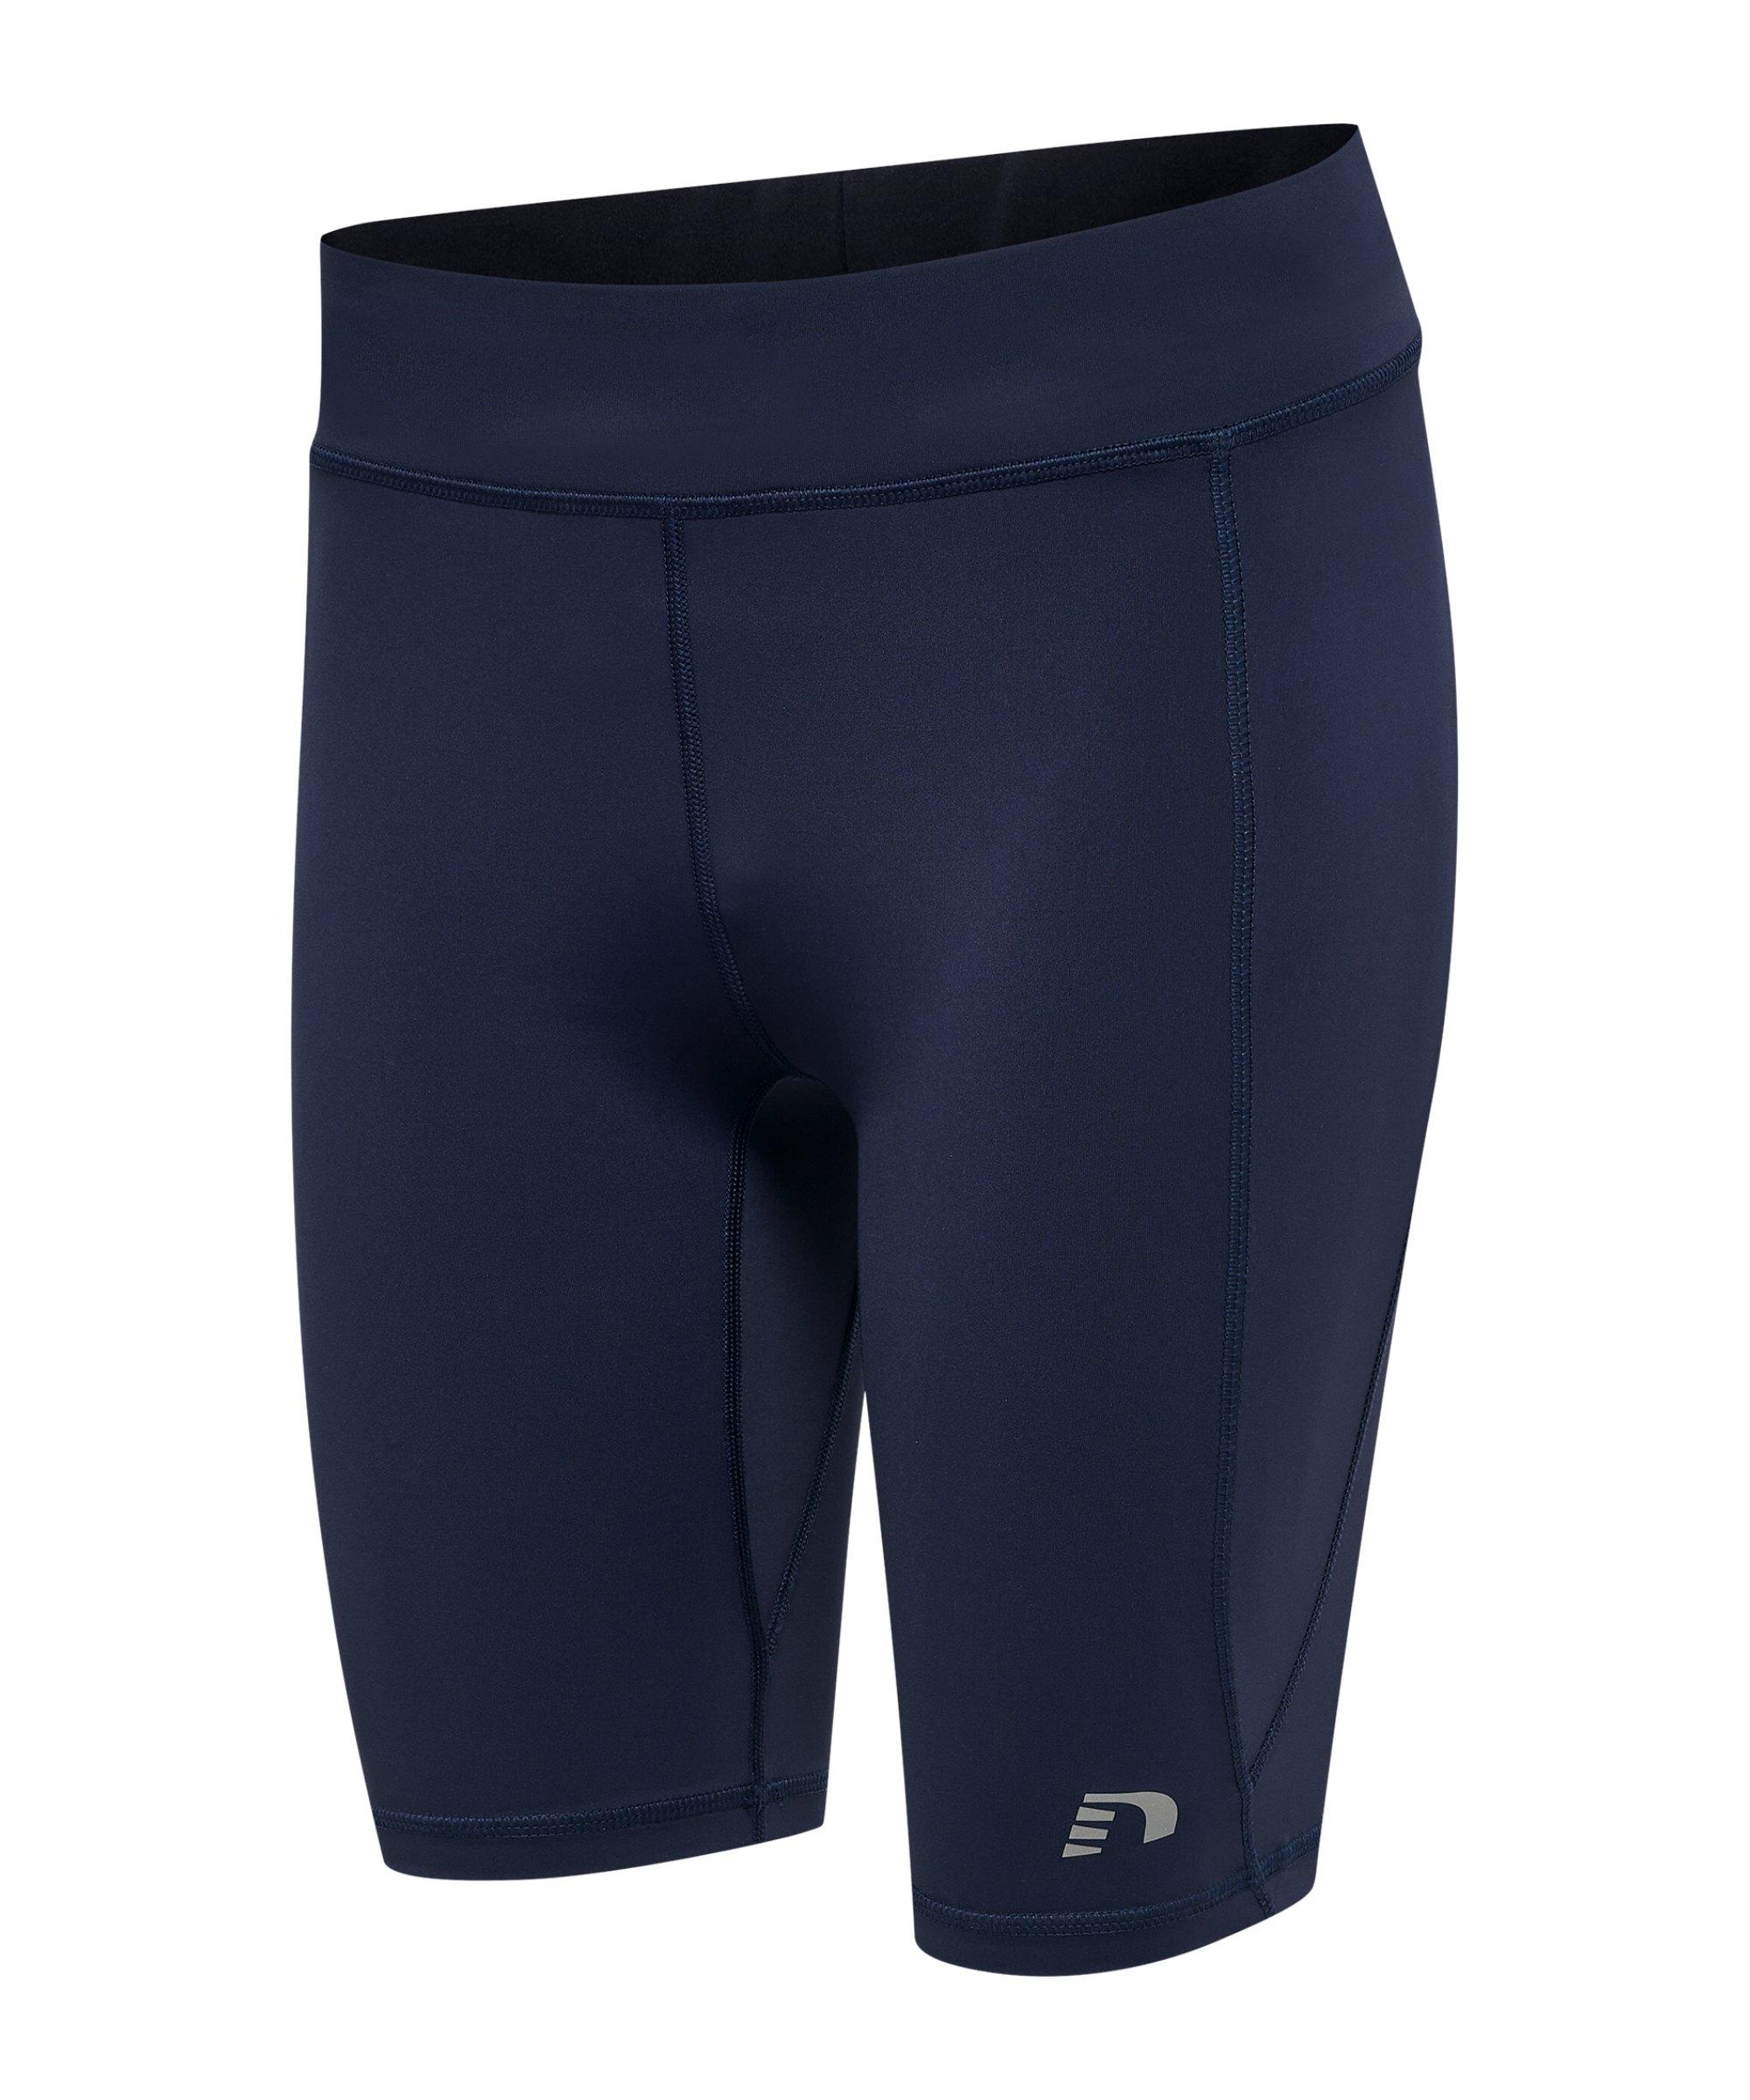 Hummel Core Short Leggings Running Damen F1009 - blau